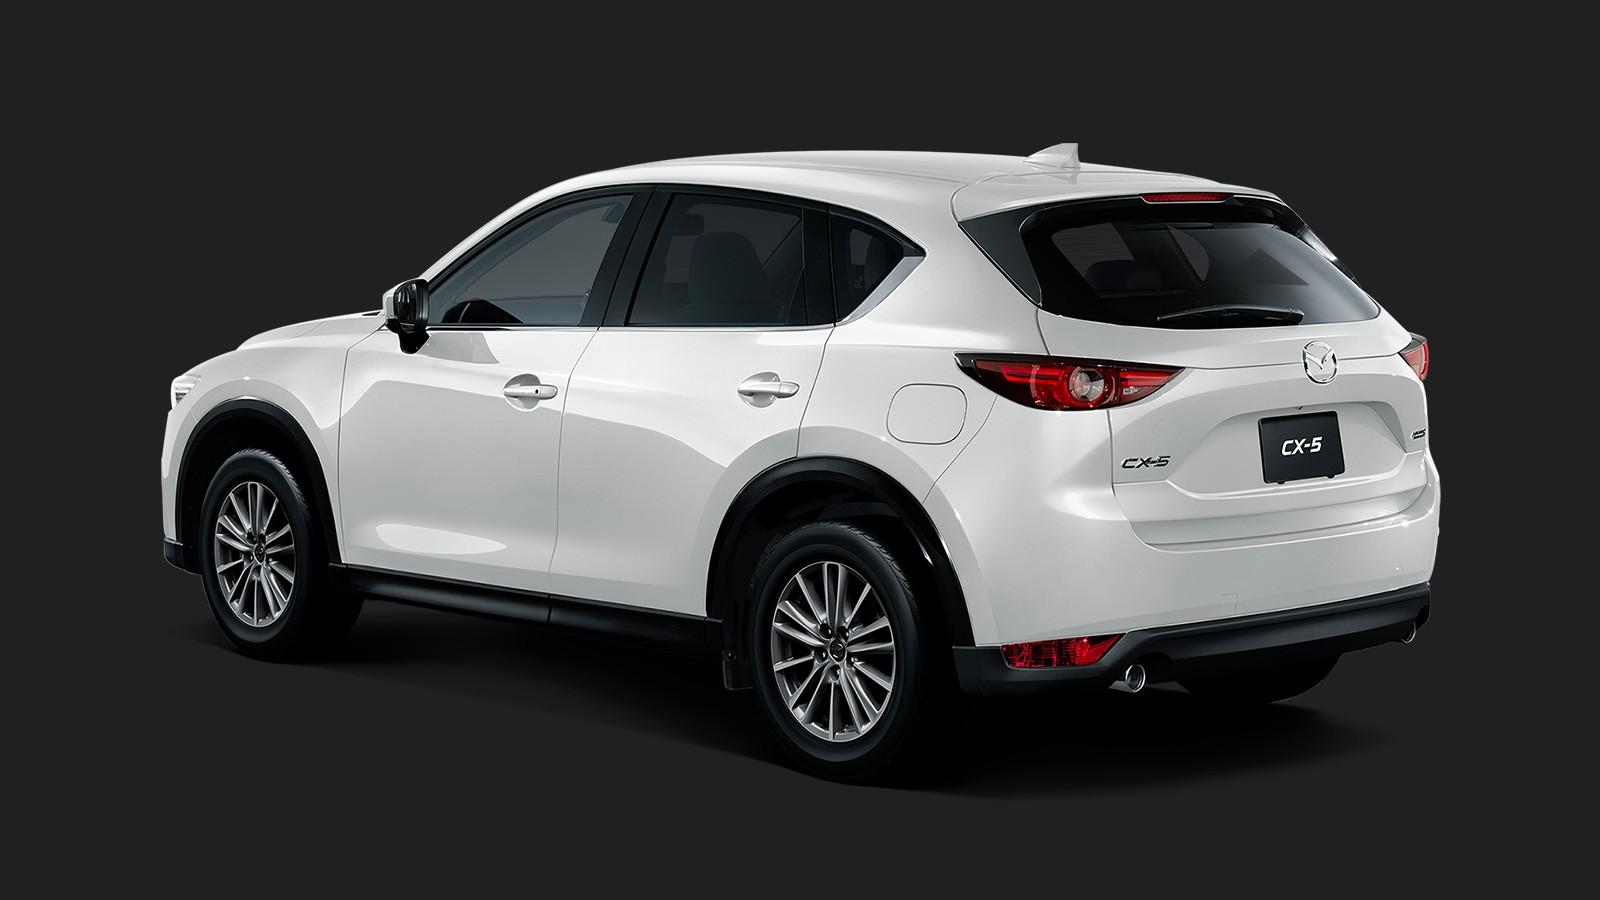 suv reviews mazda cx models chesterton review white car andrew maxx carsguide